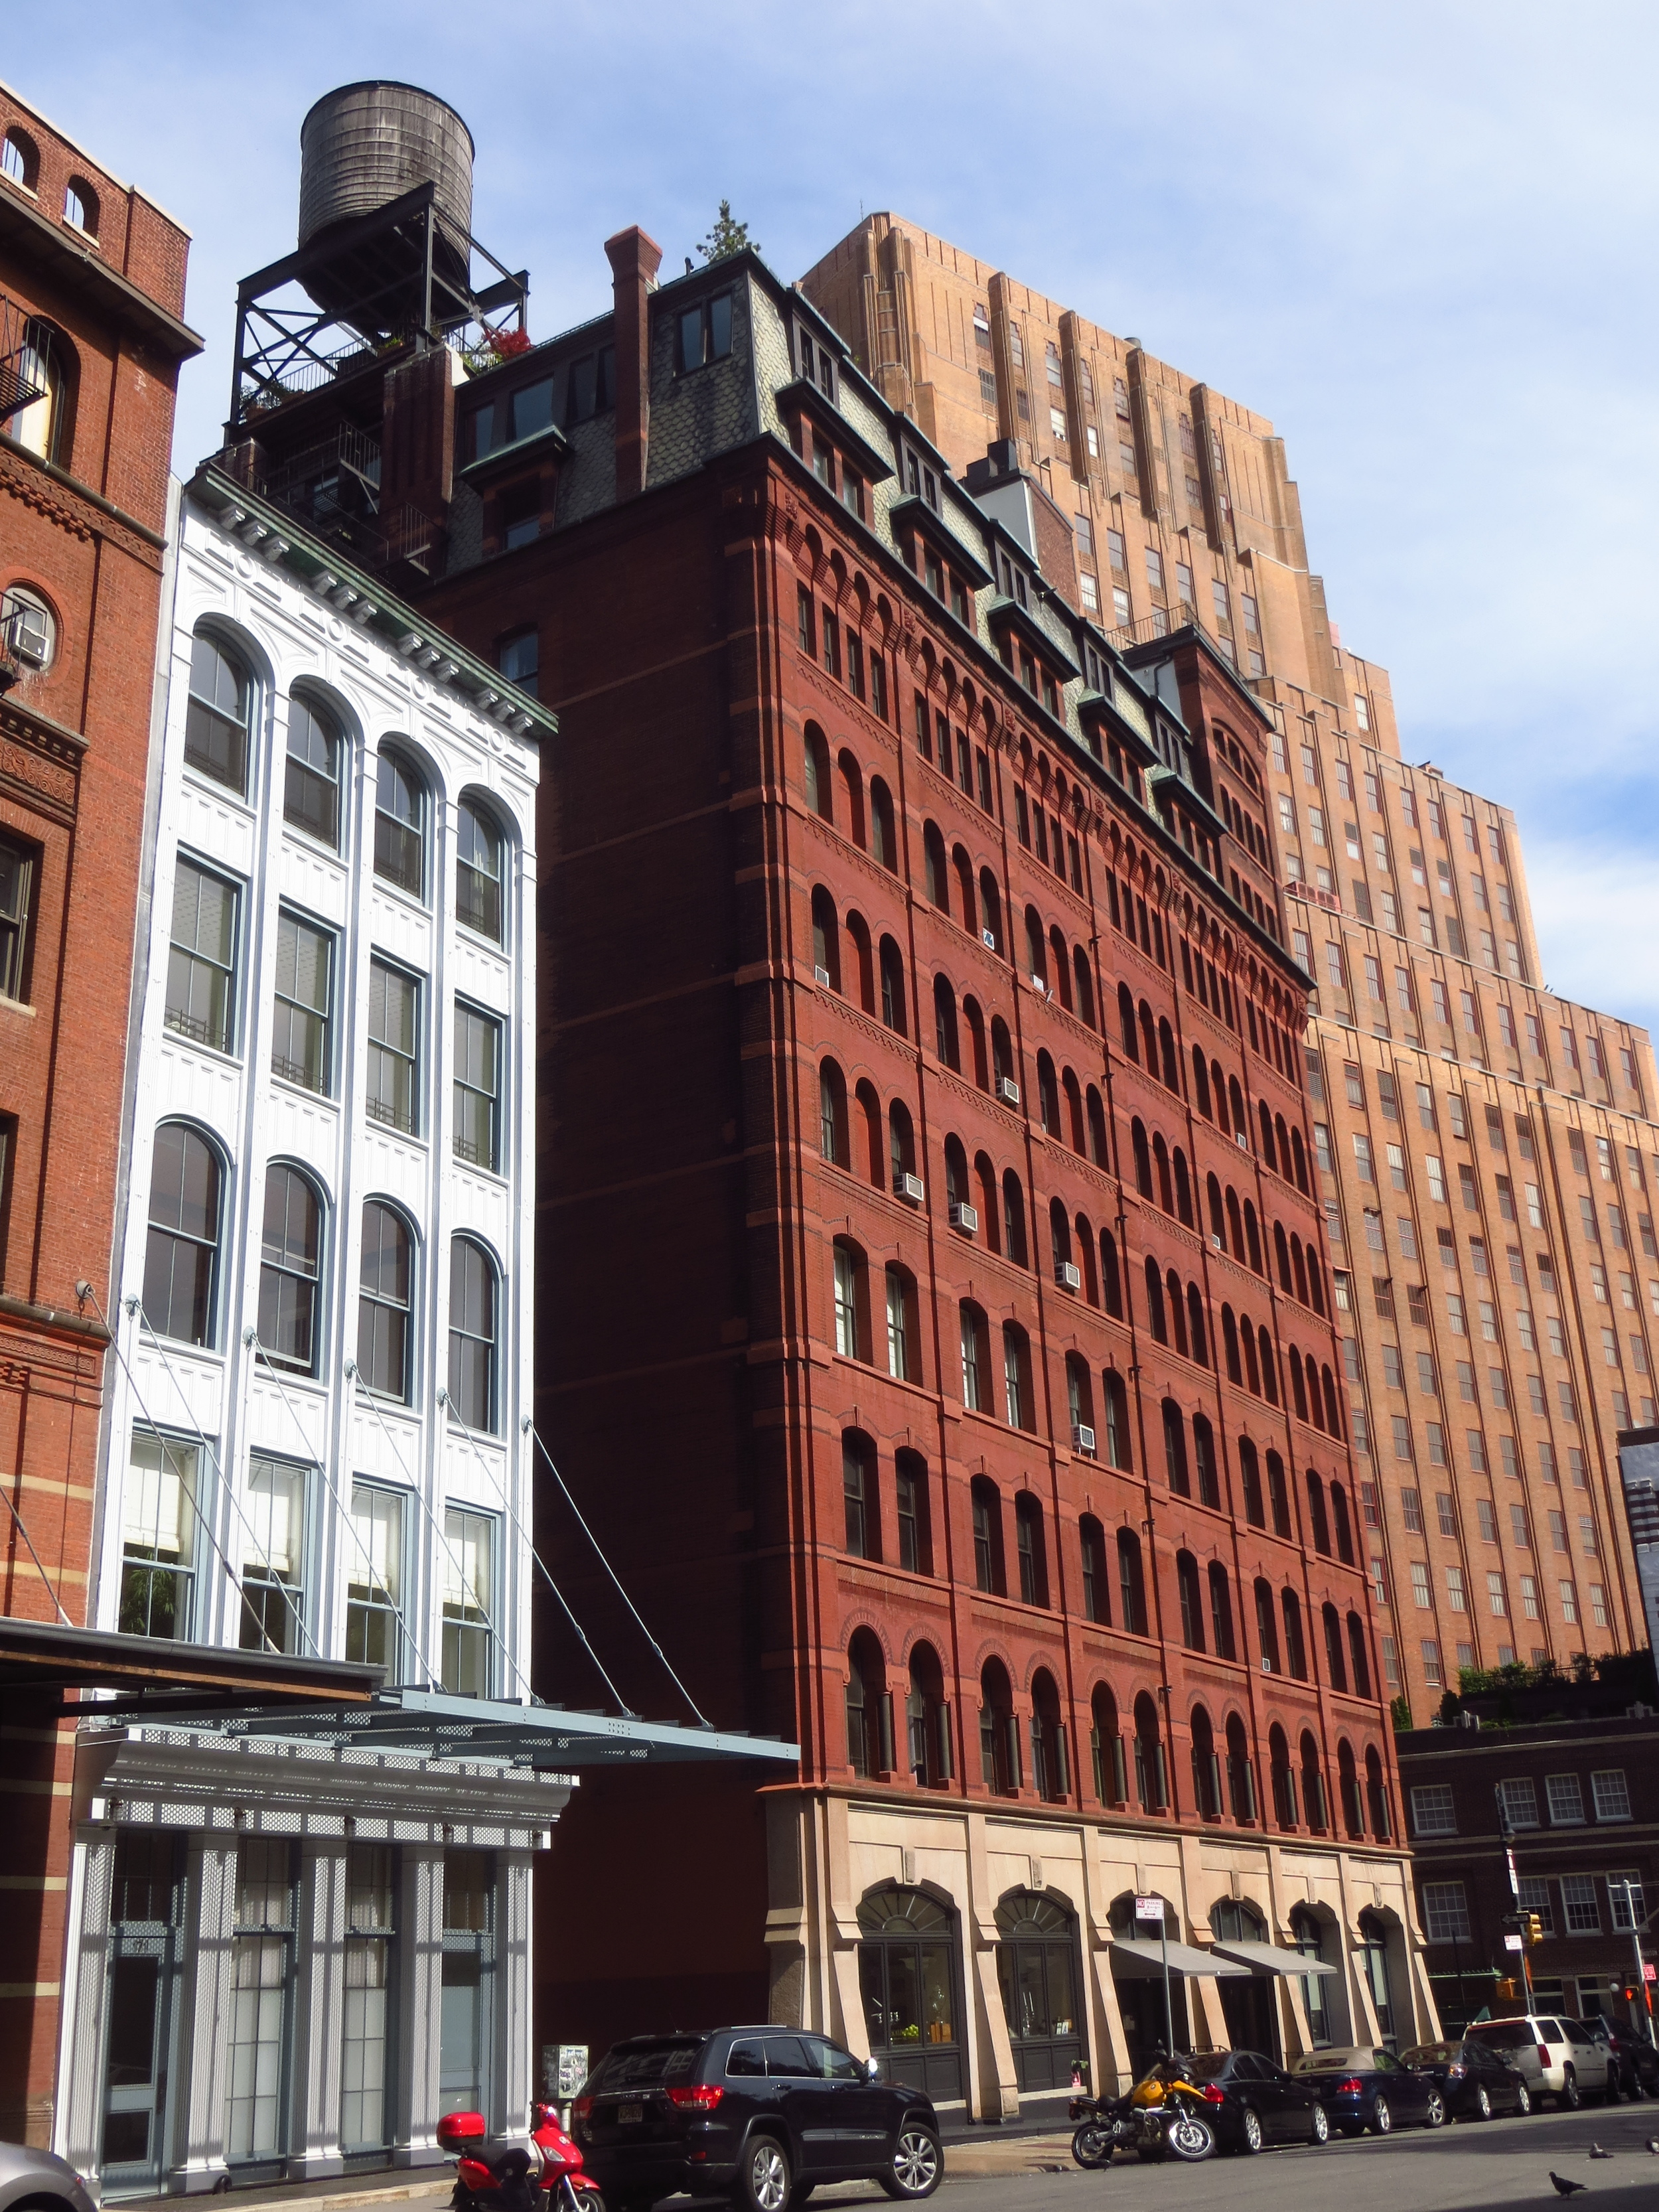 Cool buildings on Duane St.